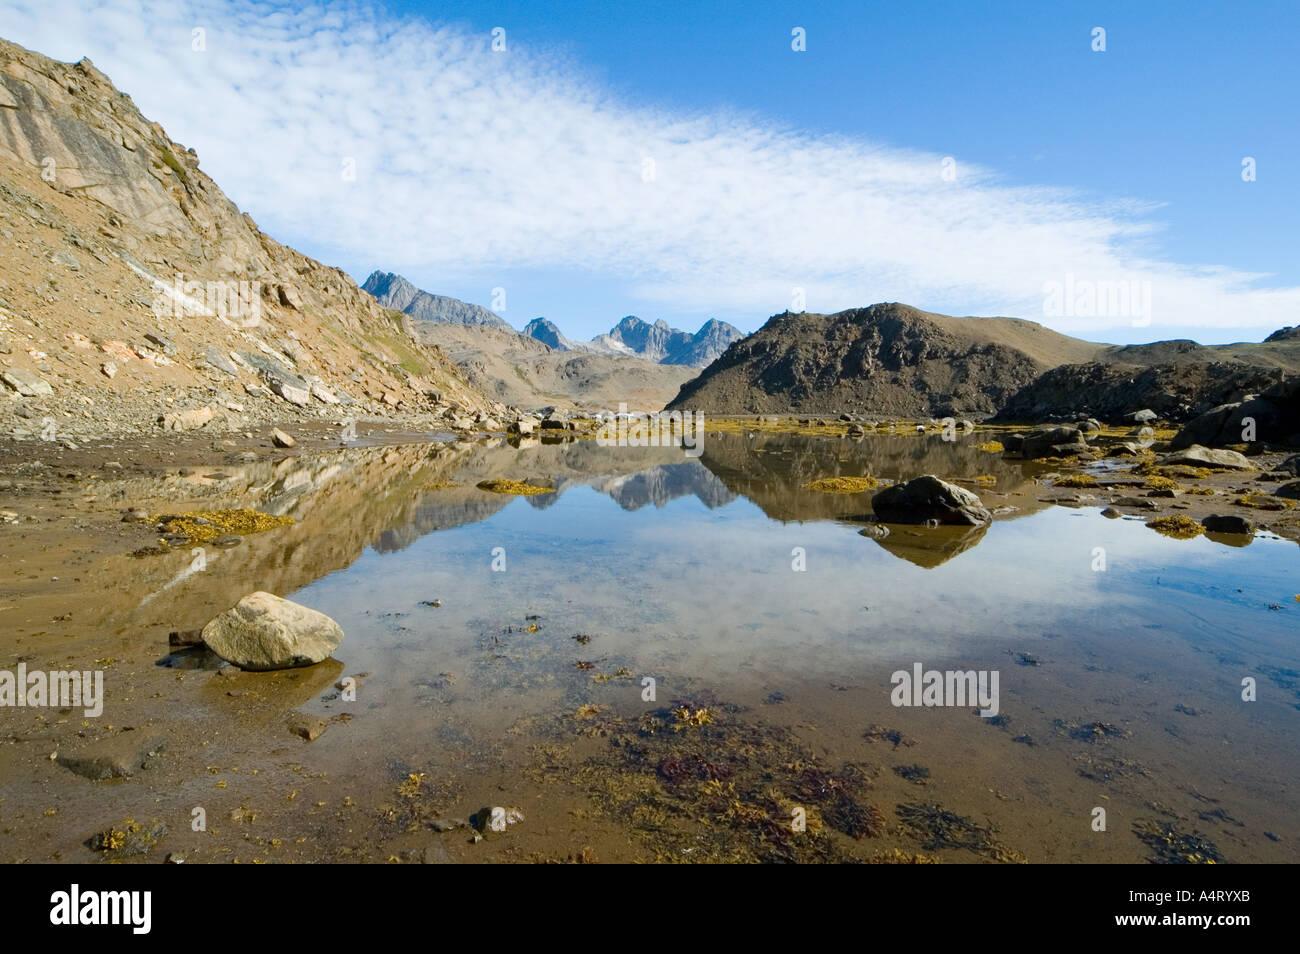 The Polhems Fjeld mountains, Angmagssalik Island, Sermilik Fjord, East Greenland - Stock Image